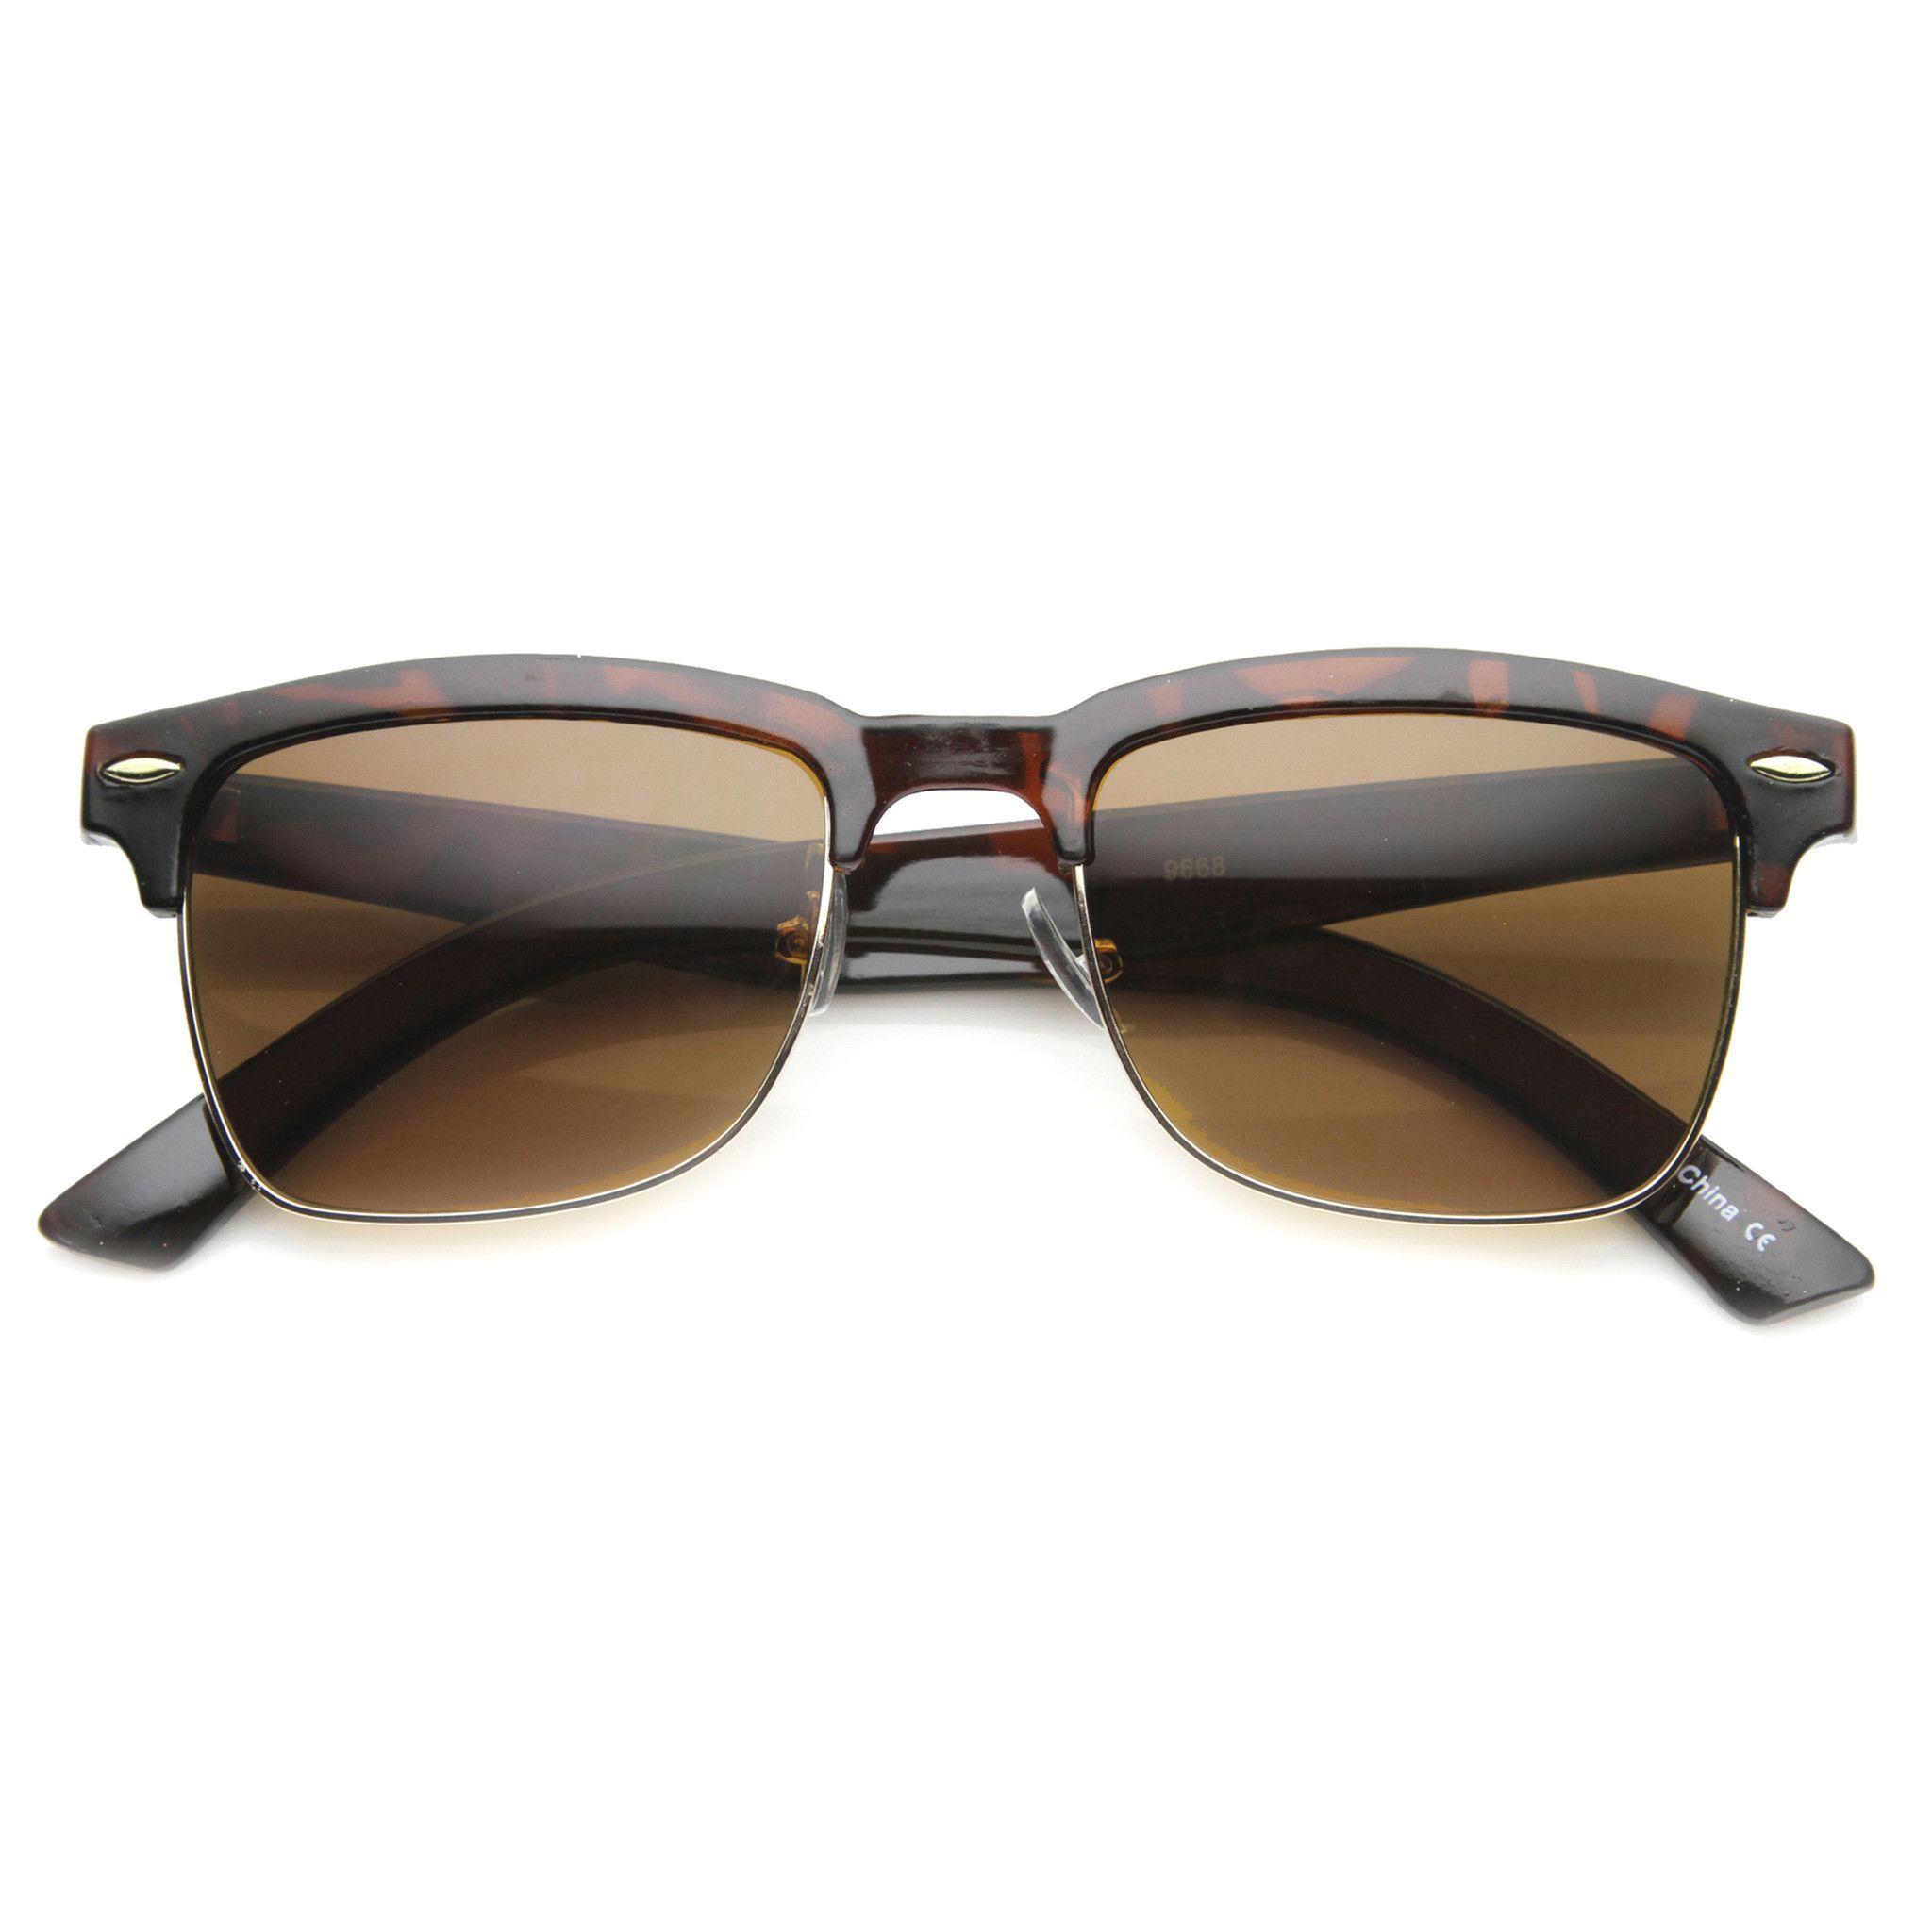 3b619d6475 Indie Dapper Square Half Frame Horned Rim Sunglasses 9809